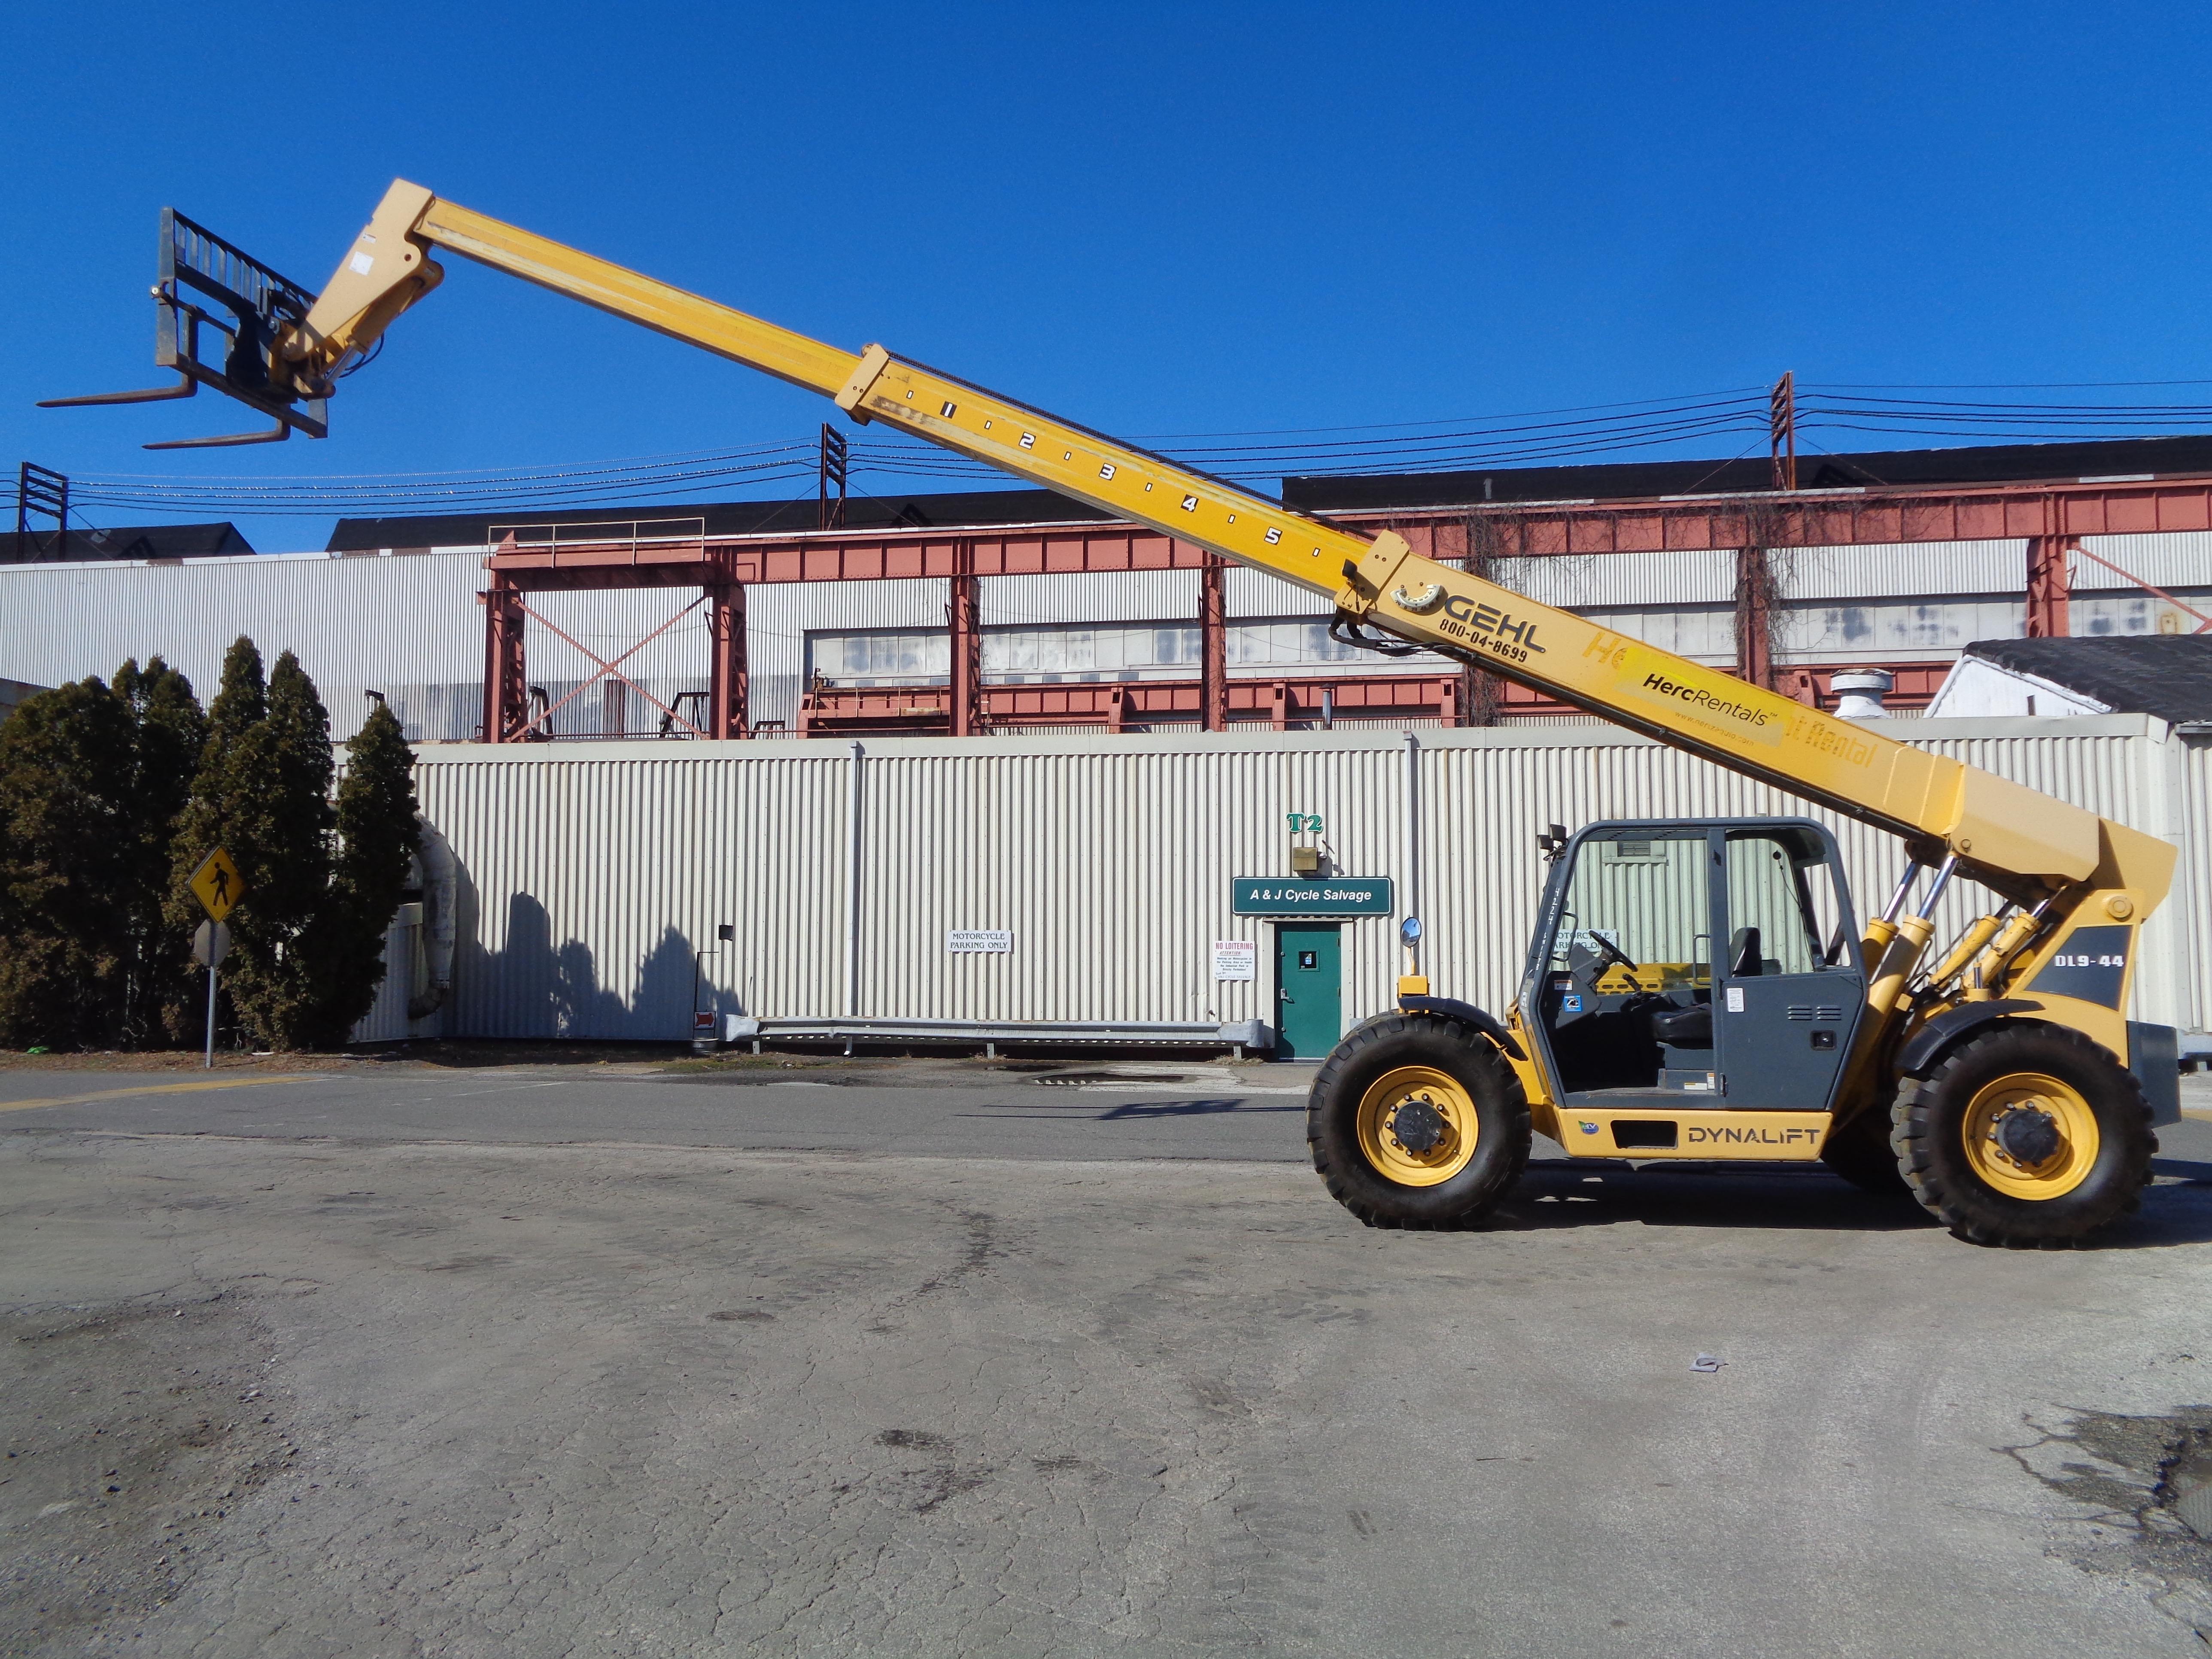 Lot 5 - 2015 Gehl DL9-44 9,000lb Telescopic Forklift